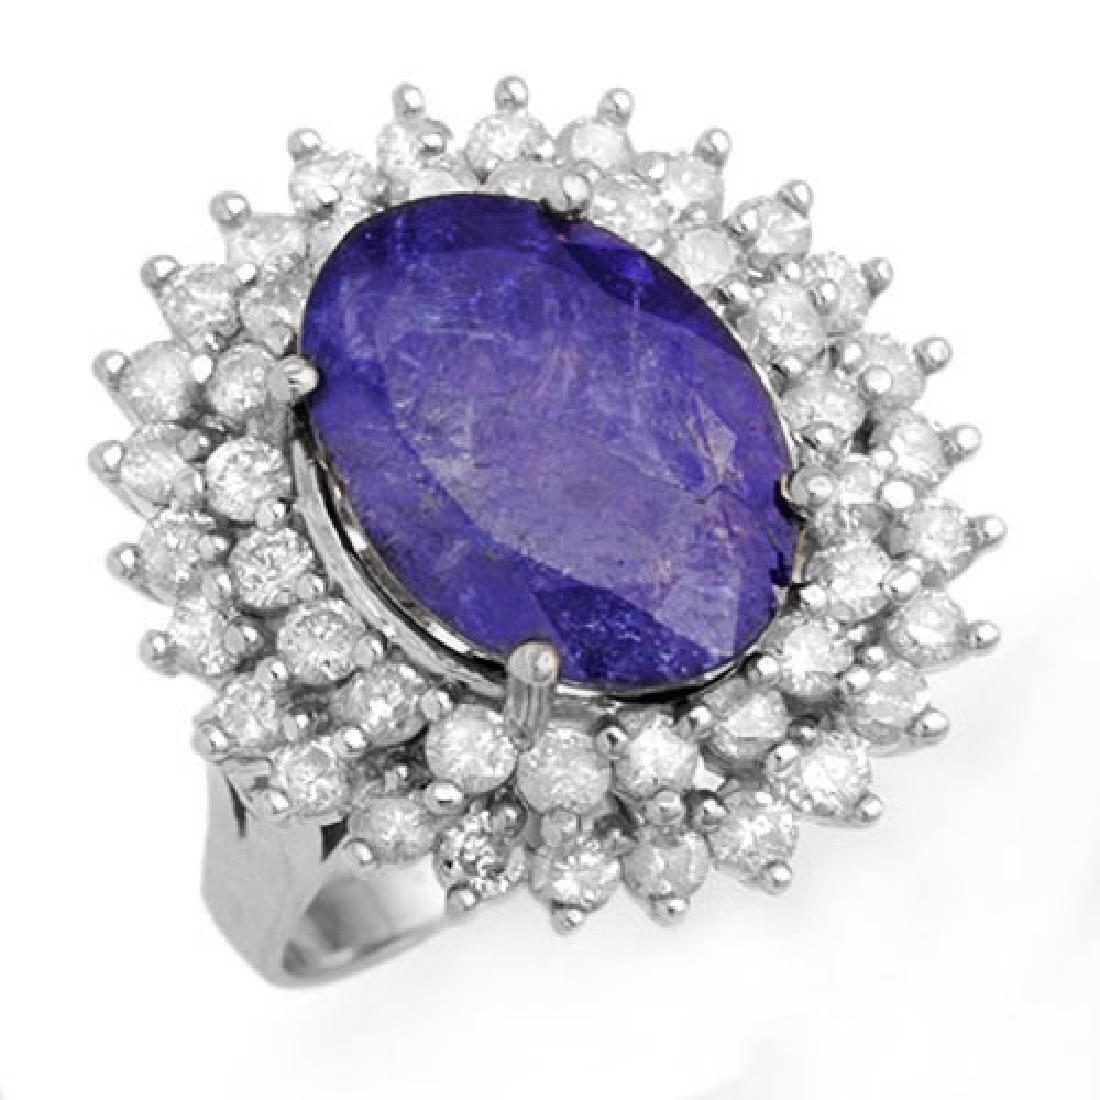 8.78 CTW Tanzanite & Diamond Ring 18K White Gold